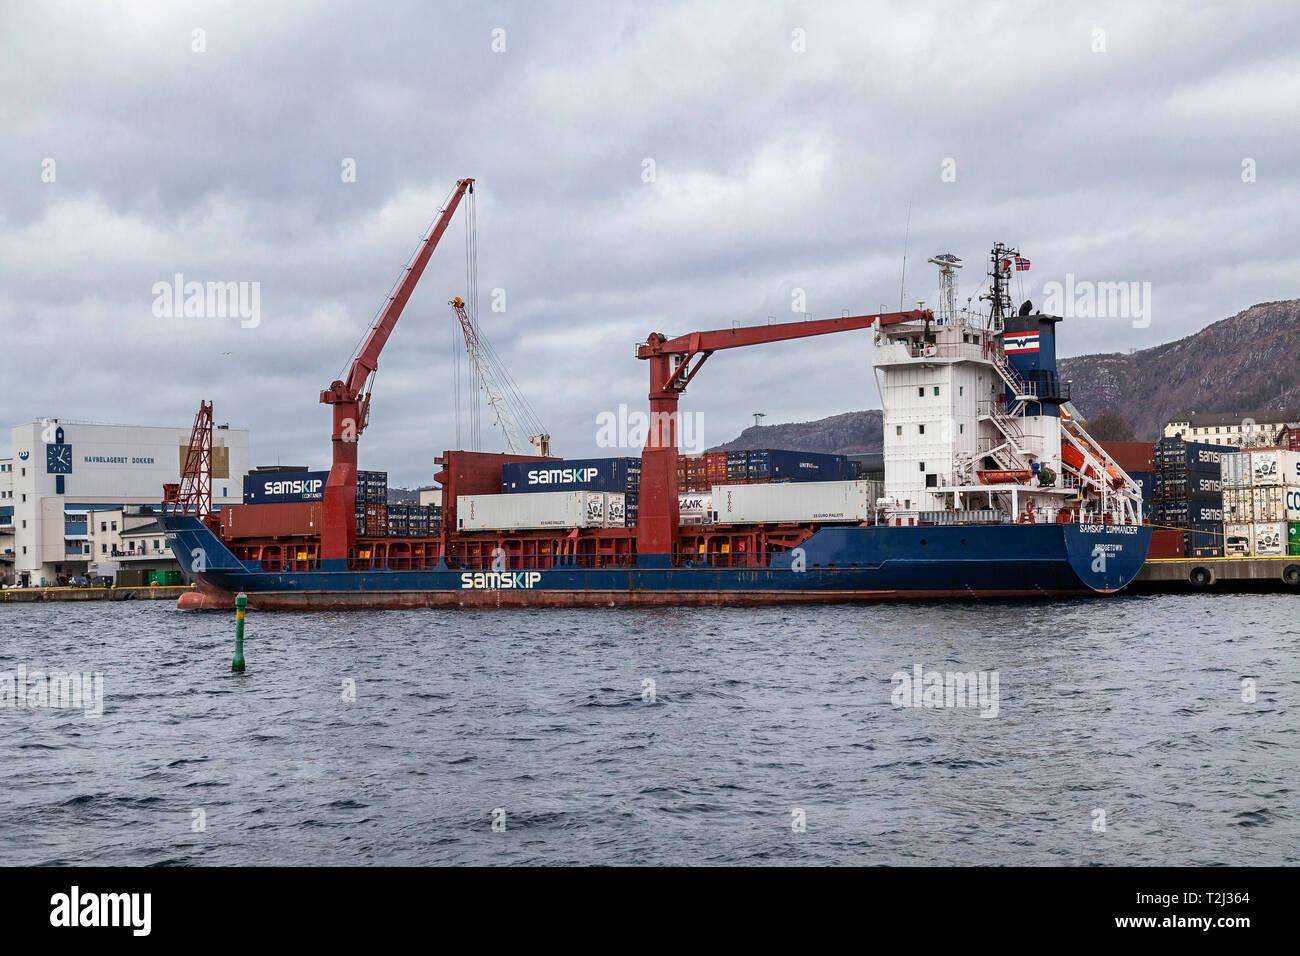 General cargo and container vessel Samskip Commander at work at Dokken terminal (Dokkeskjærskaien), in the port of Bergen, Norway. - Stock Image